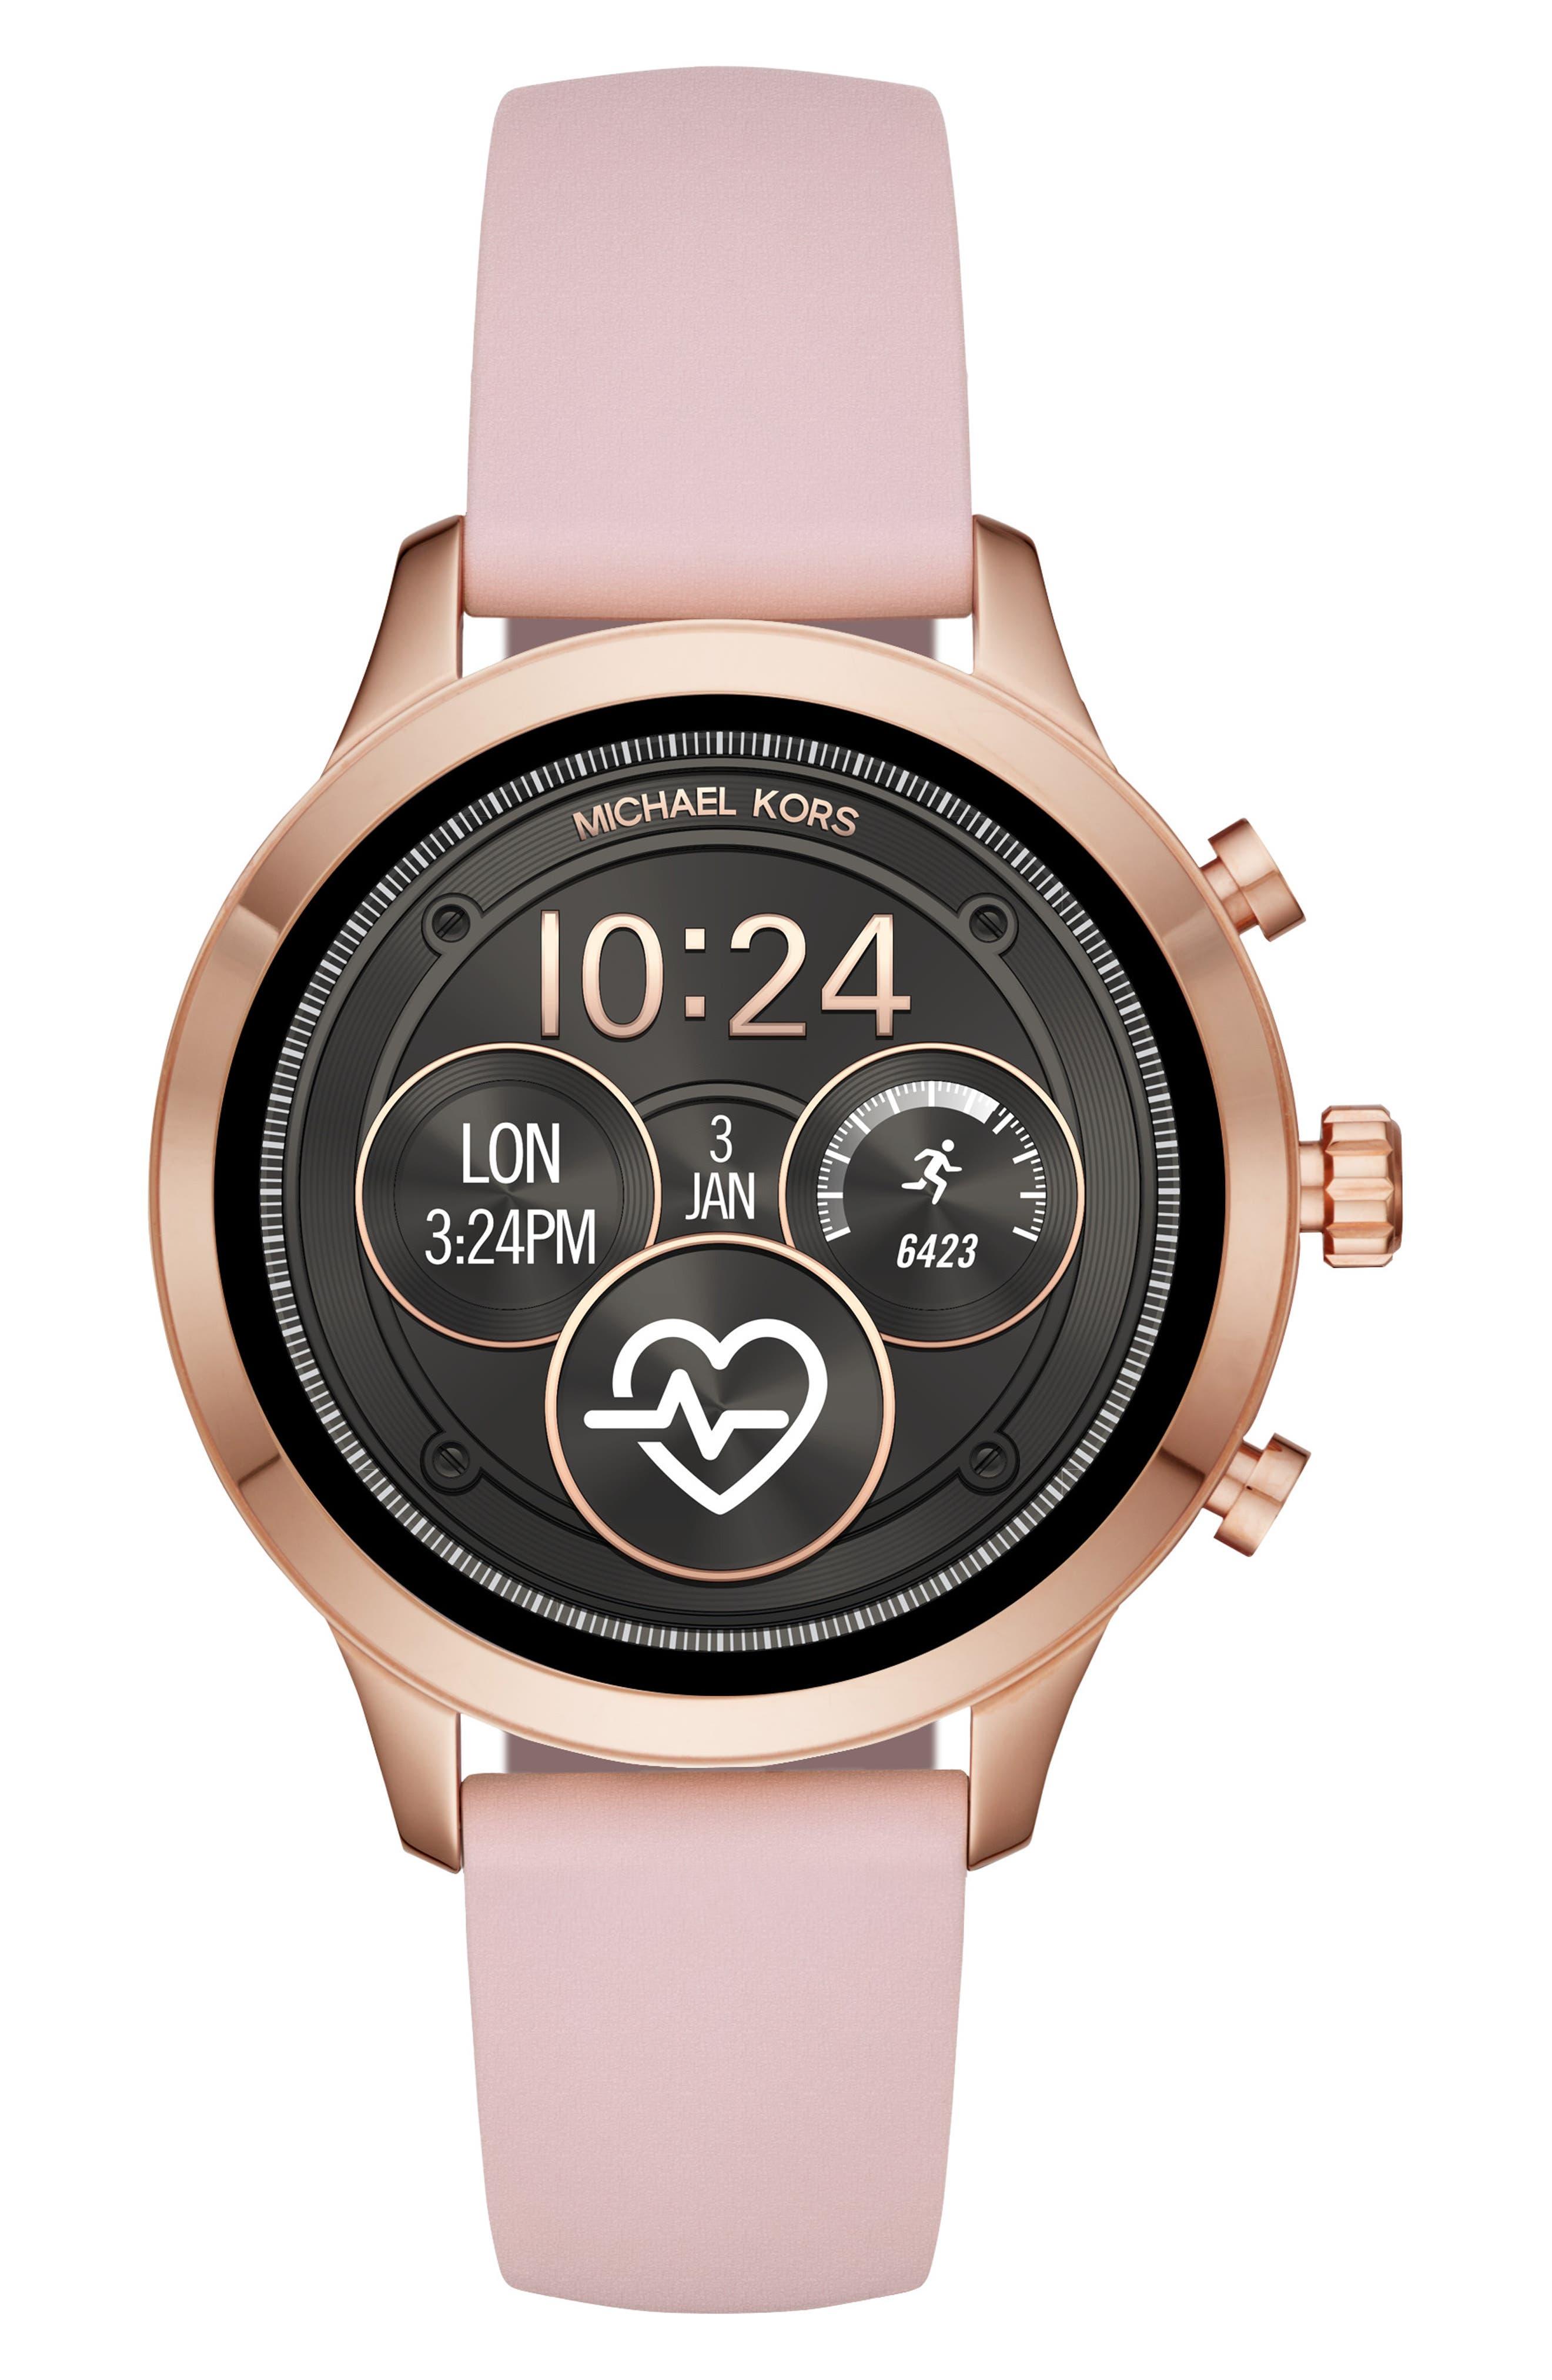 MICHAEL KORS,                             MICHAEL Michael Kors Access Runway Smart Watch, 41mm,                             Main thumbnail 1, color,                             PINK/ ROSE GOLD